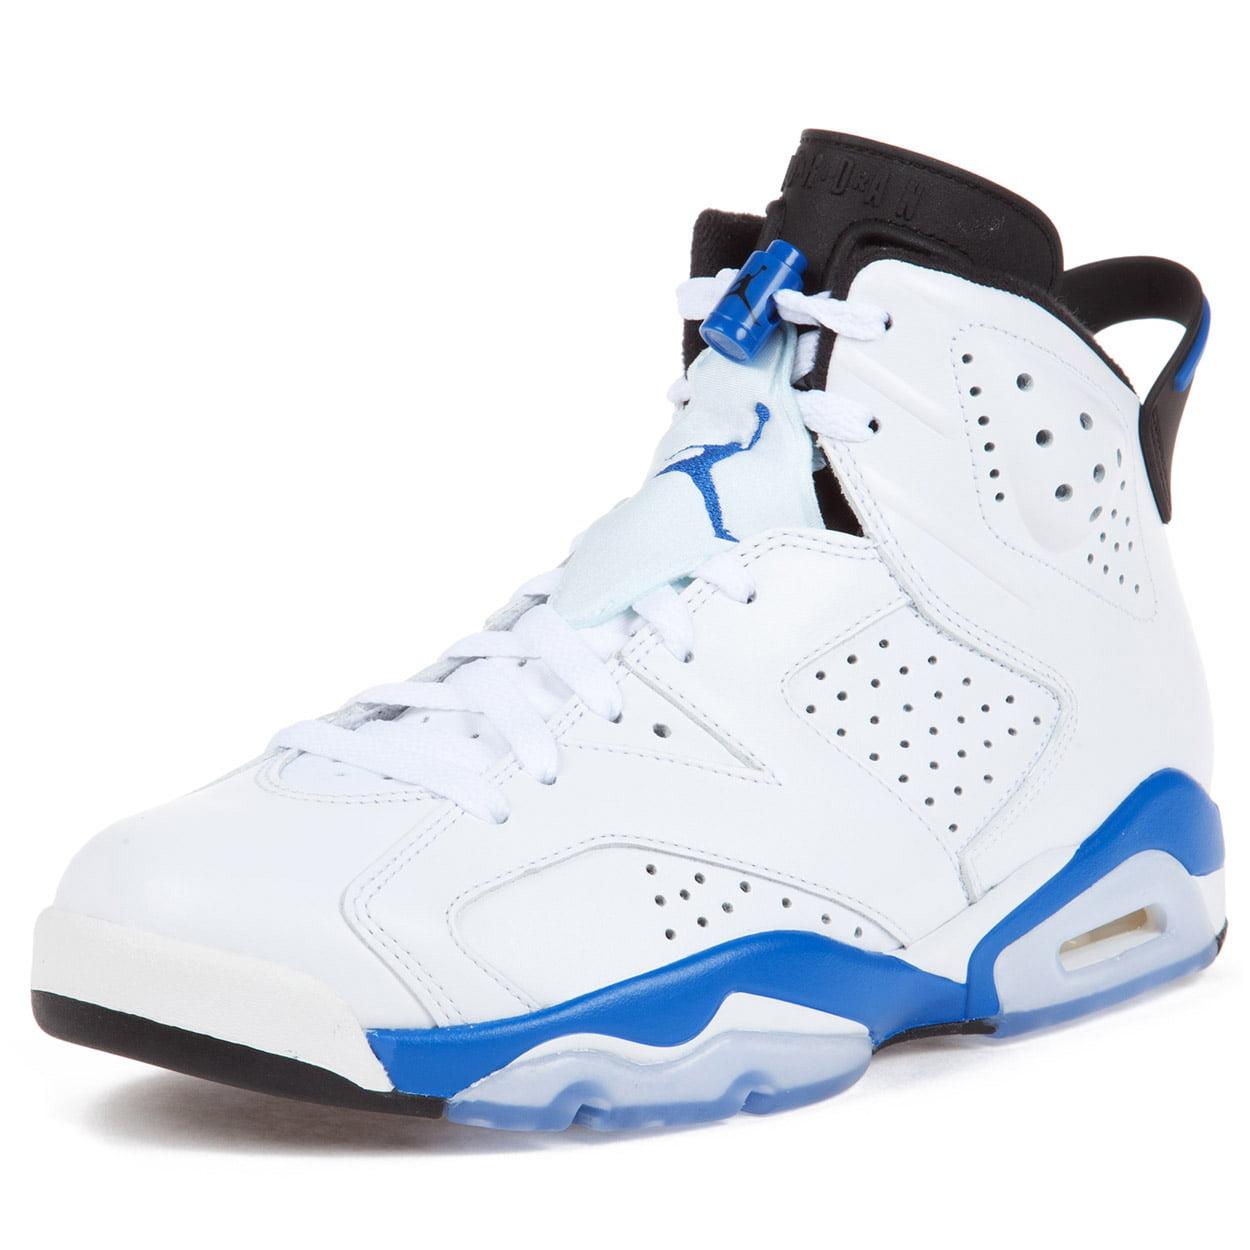 competitive price a8785 3ed38 ebay air jordan6 braun blau 44ad8 58415